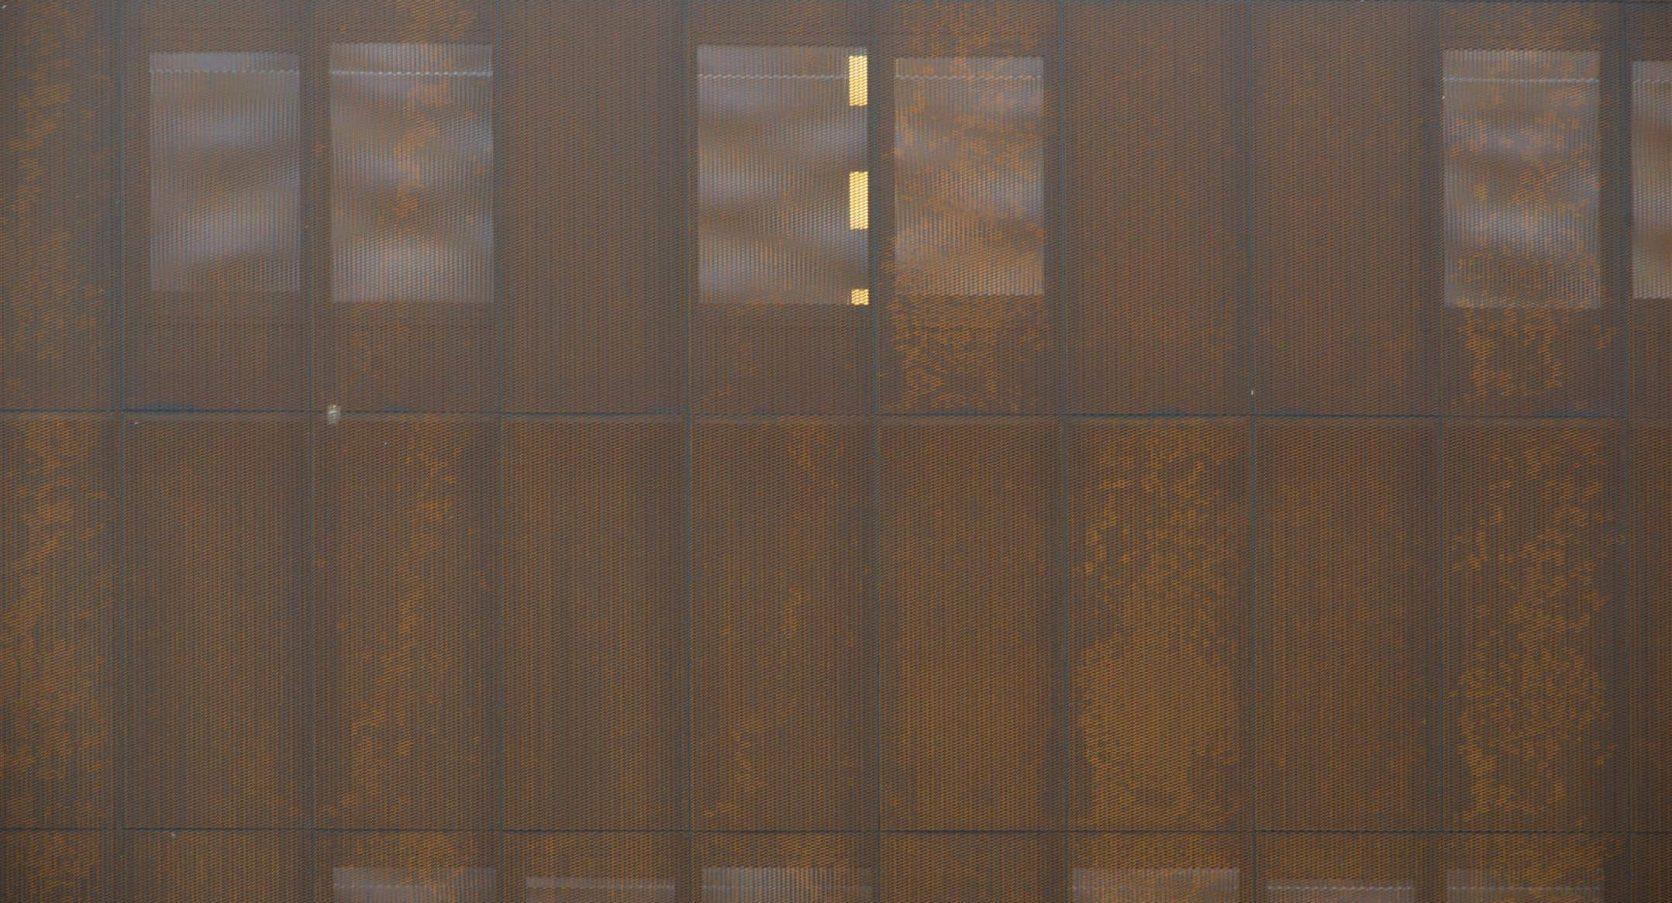 Corten Strekmetaal panelen als gevelbekleding bij Toyota Materyal Handling in Ede